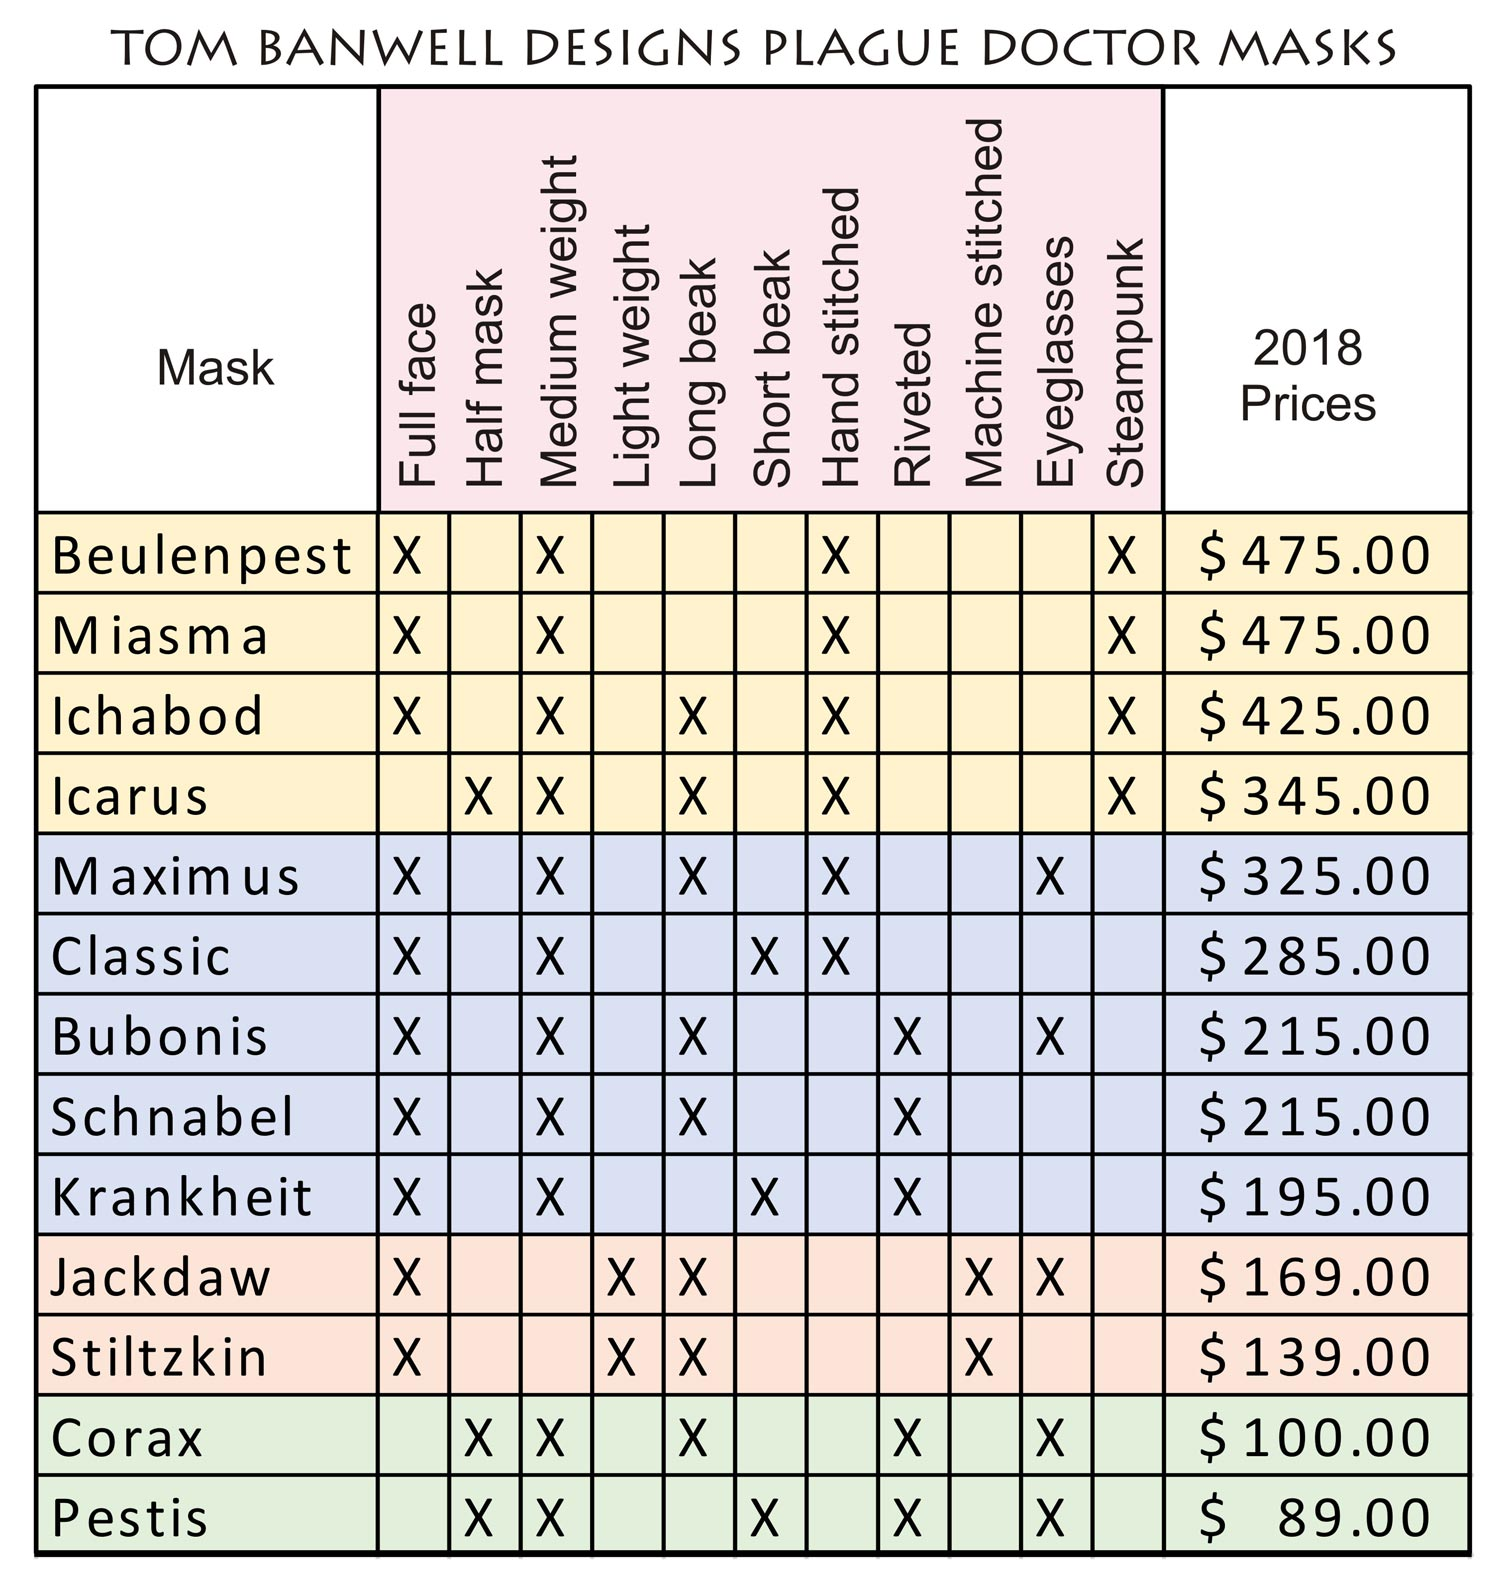 Chart comparing Tom Banwell's thirteen plague doctor masks